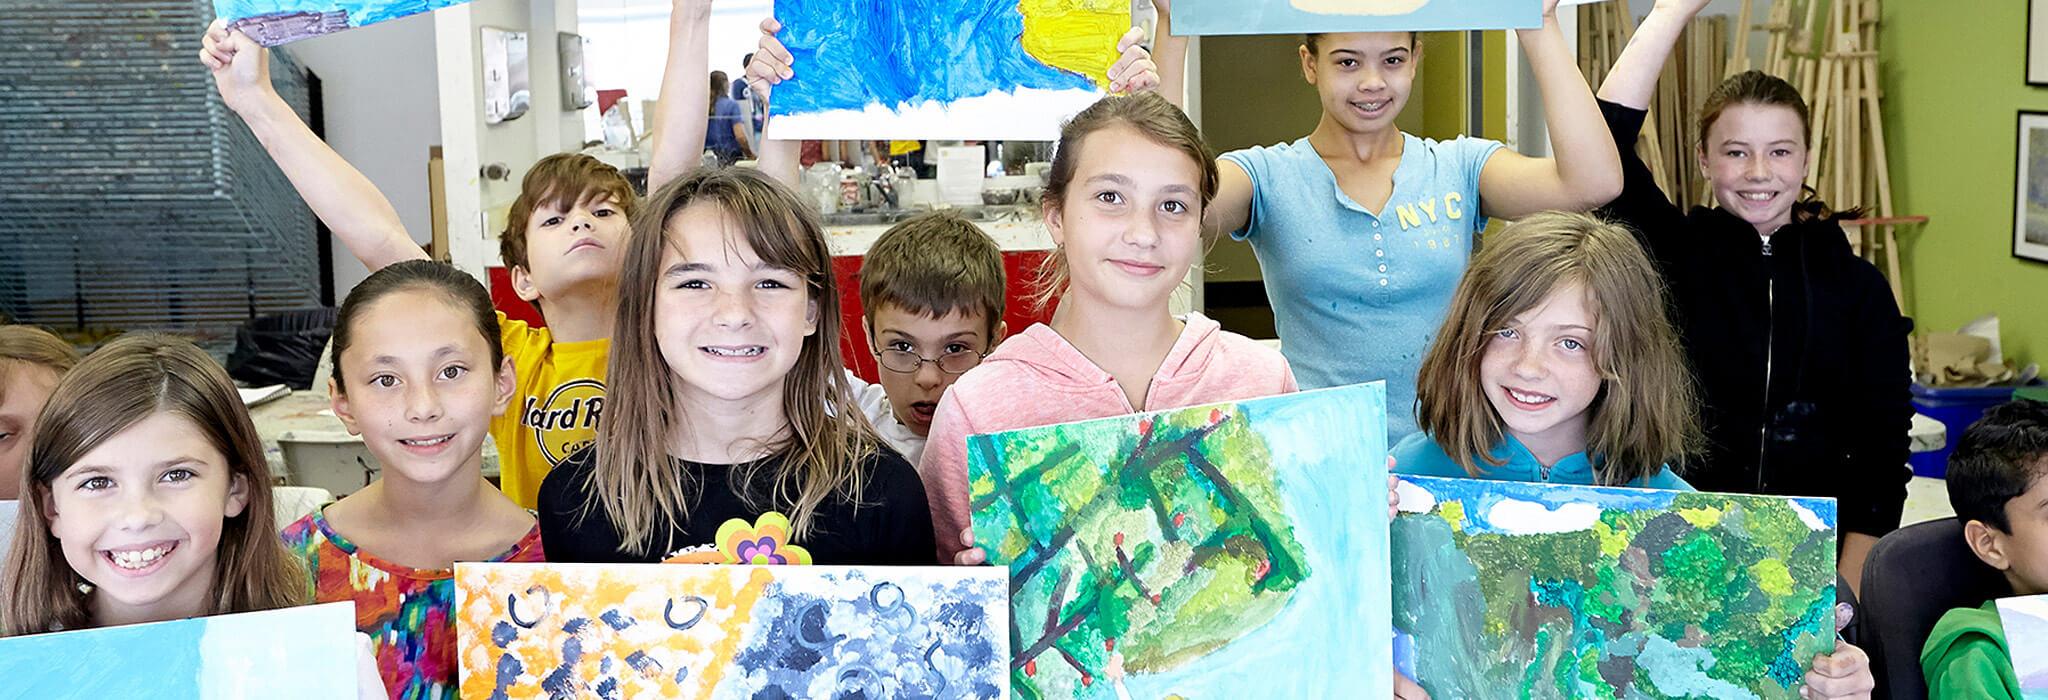 Art Gallery of Hamilton - Learn